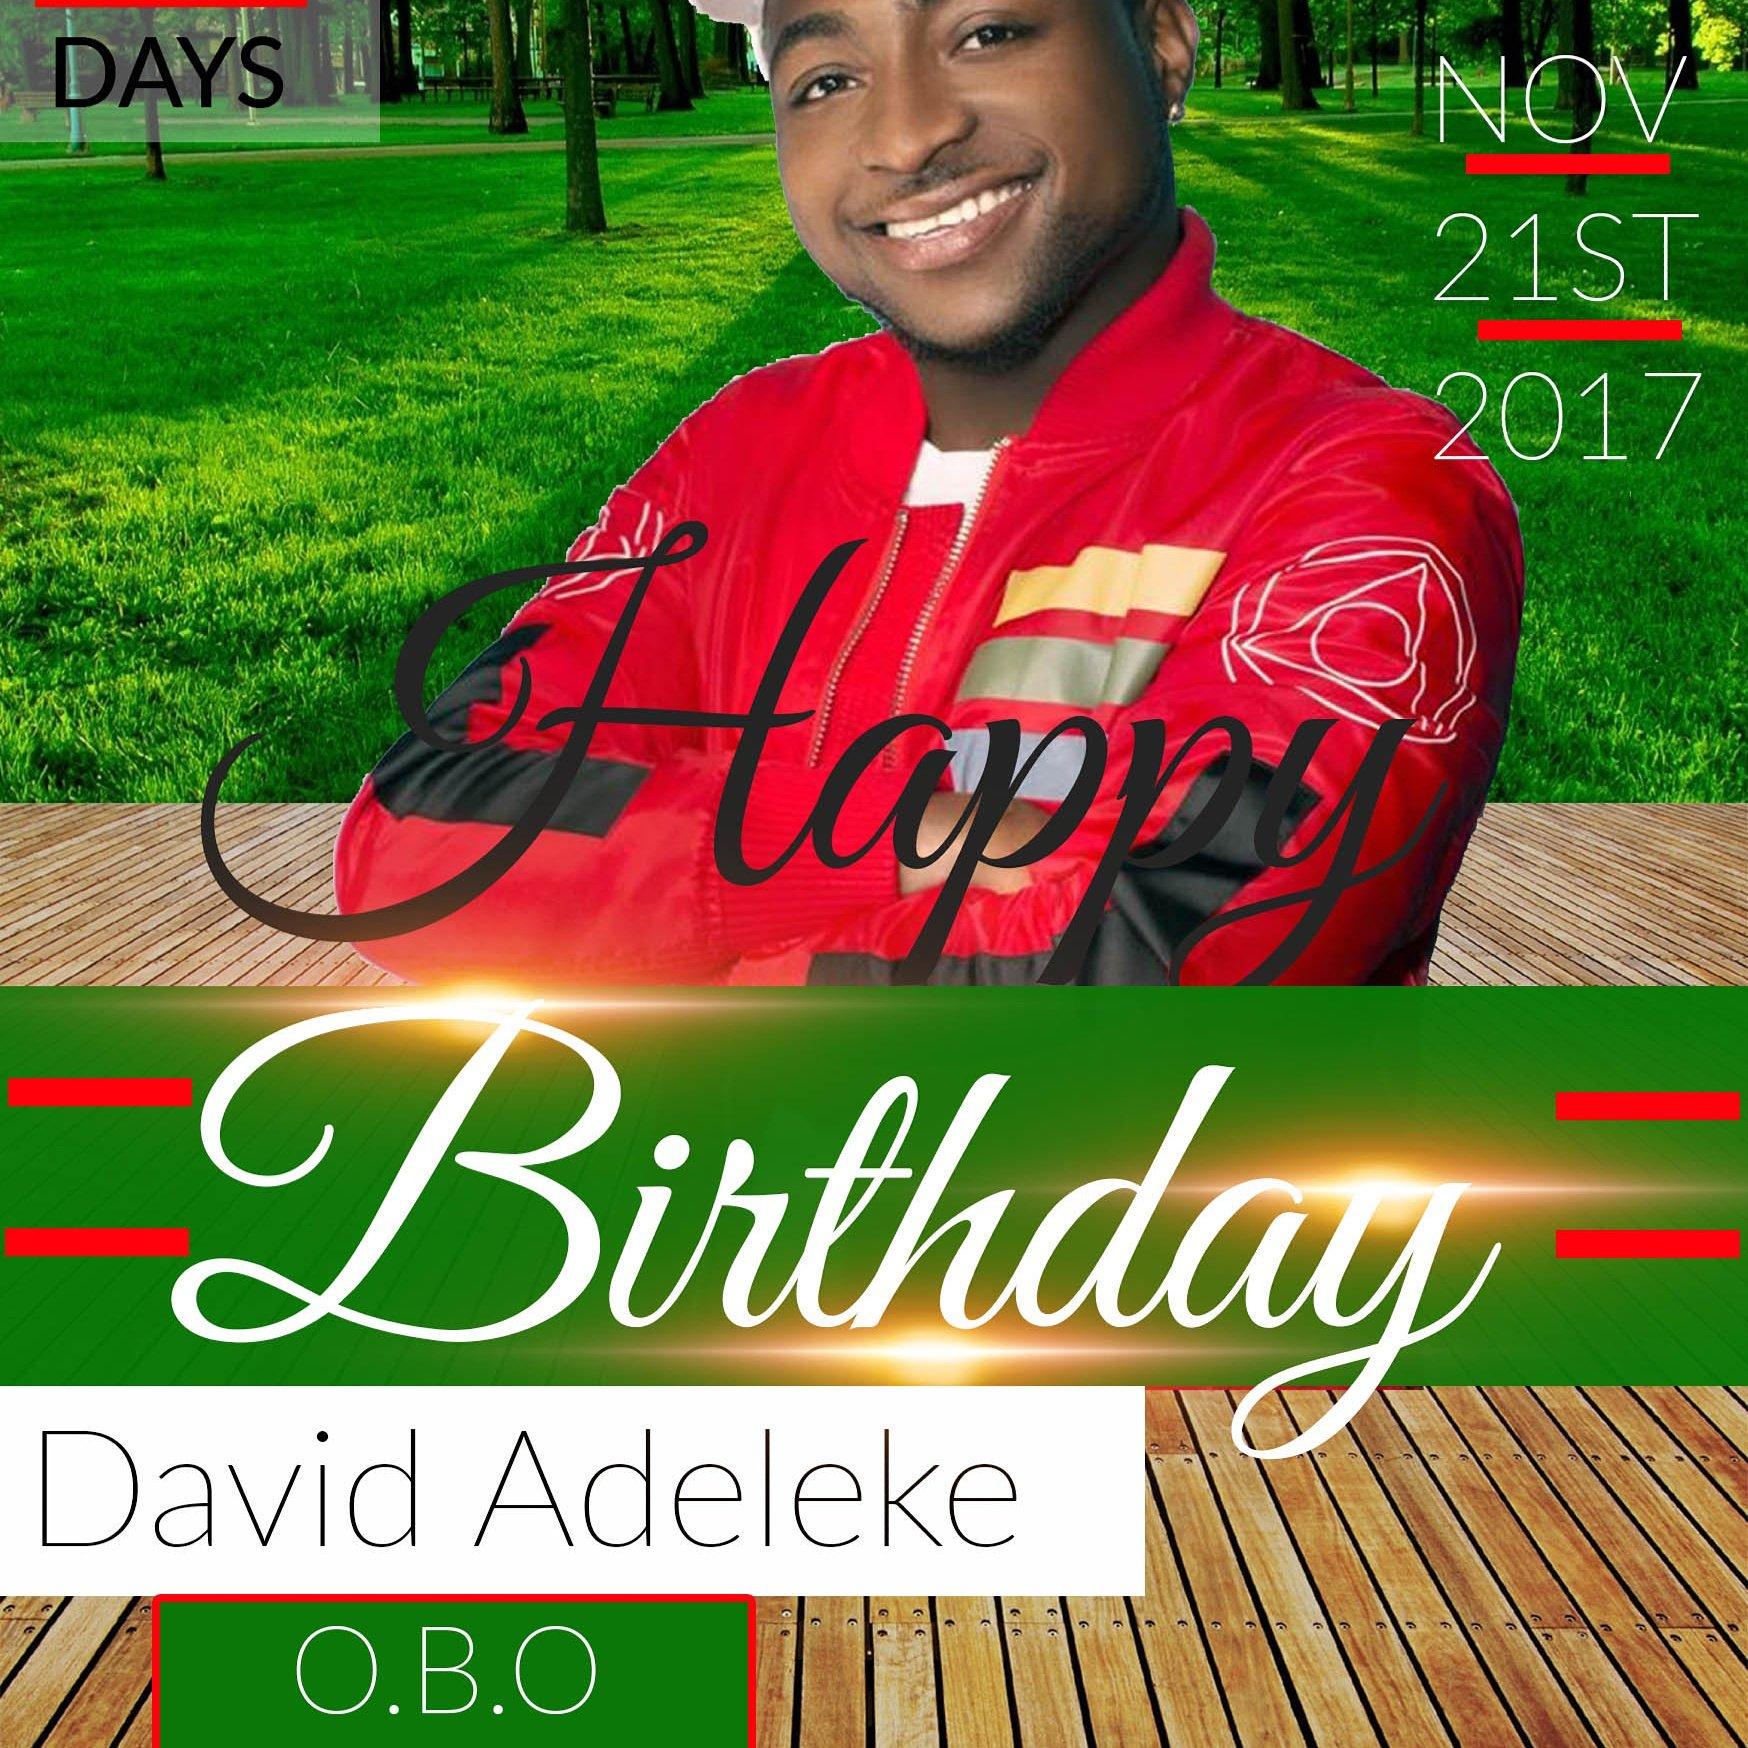 Happy birthday to david adeleke (davido) wish u long life and prosperity in fud health and wealth